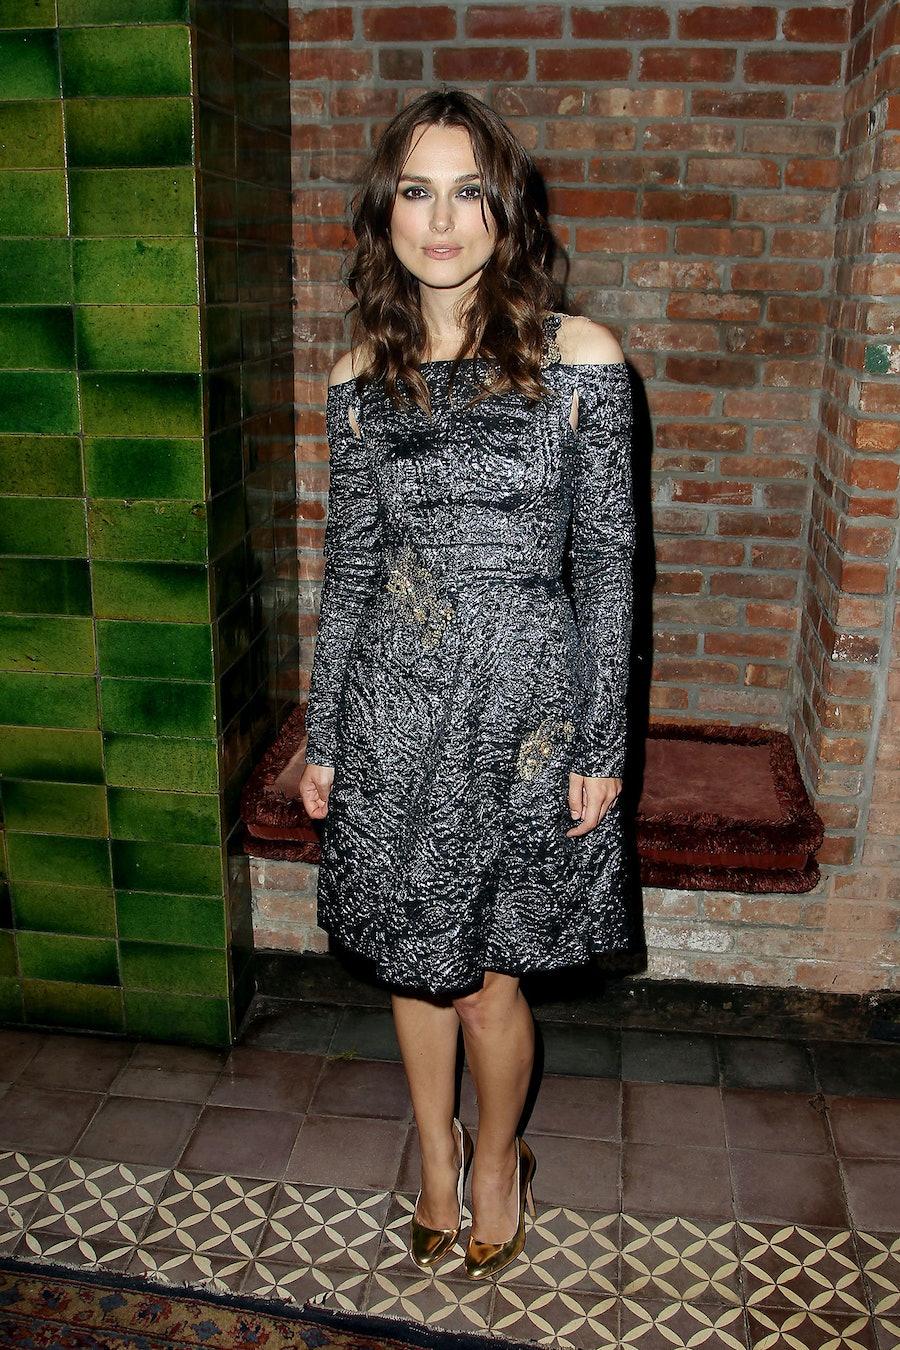 Keira Knightley at Begin Again Premiere